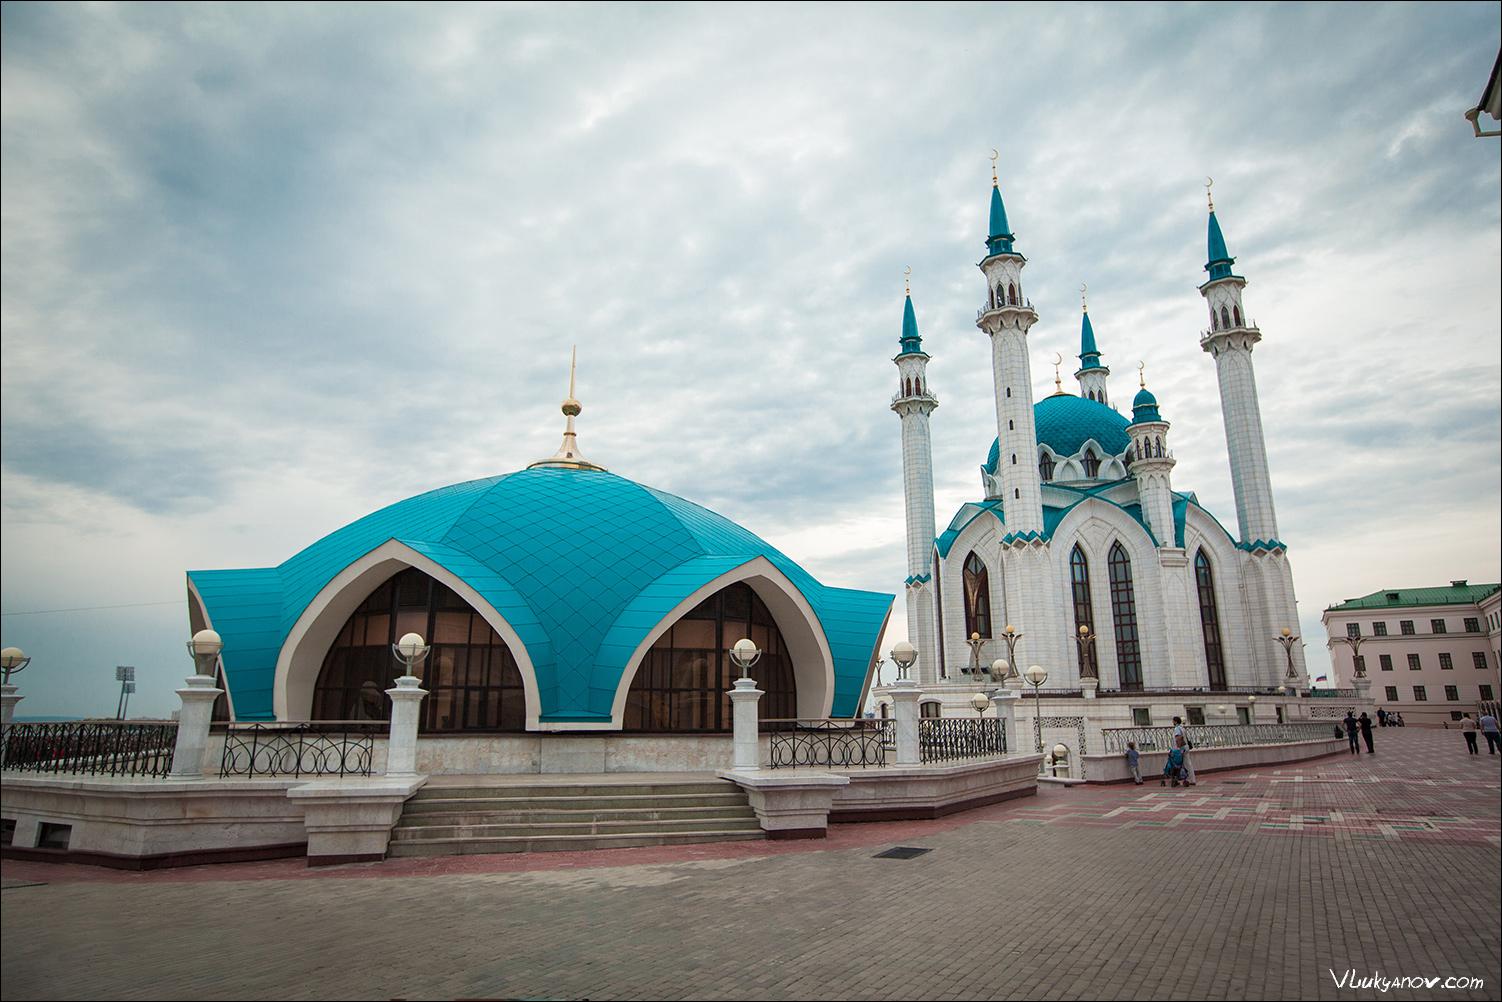 Фотограф, Владимир Лукьянов, Казань, мечеть Кул Шариф